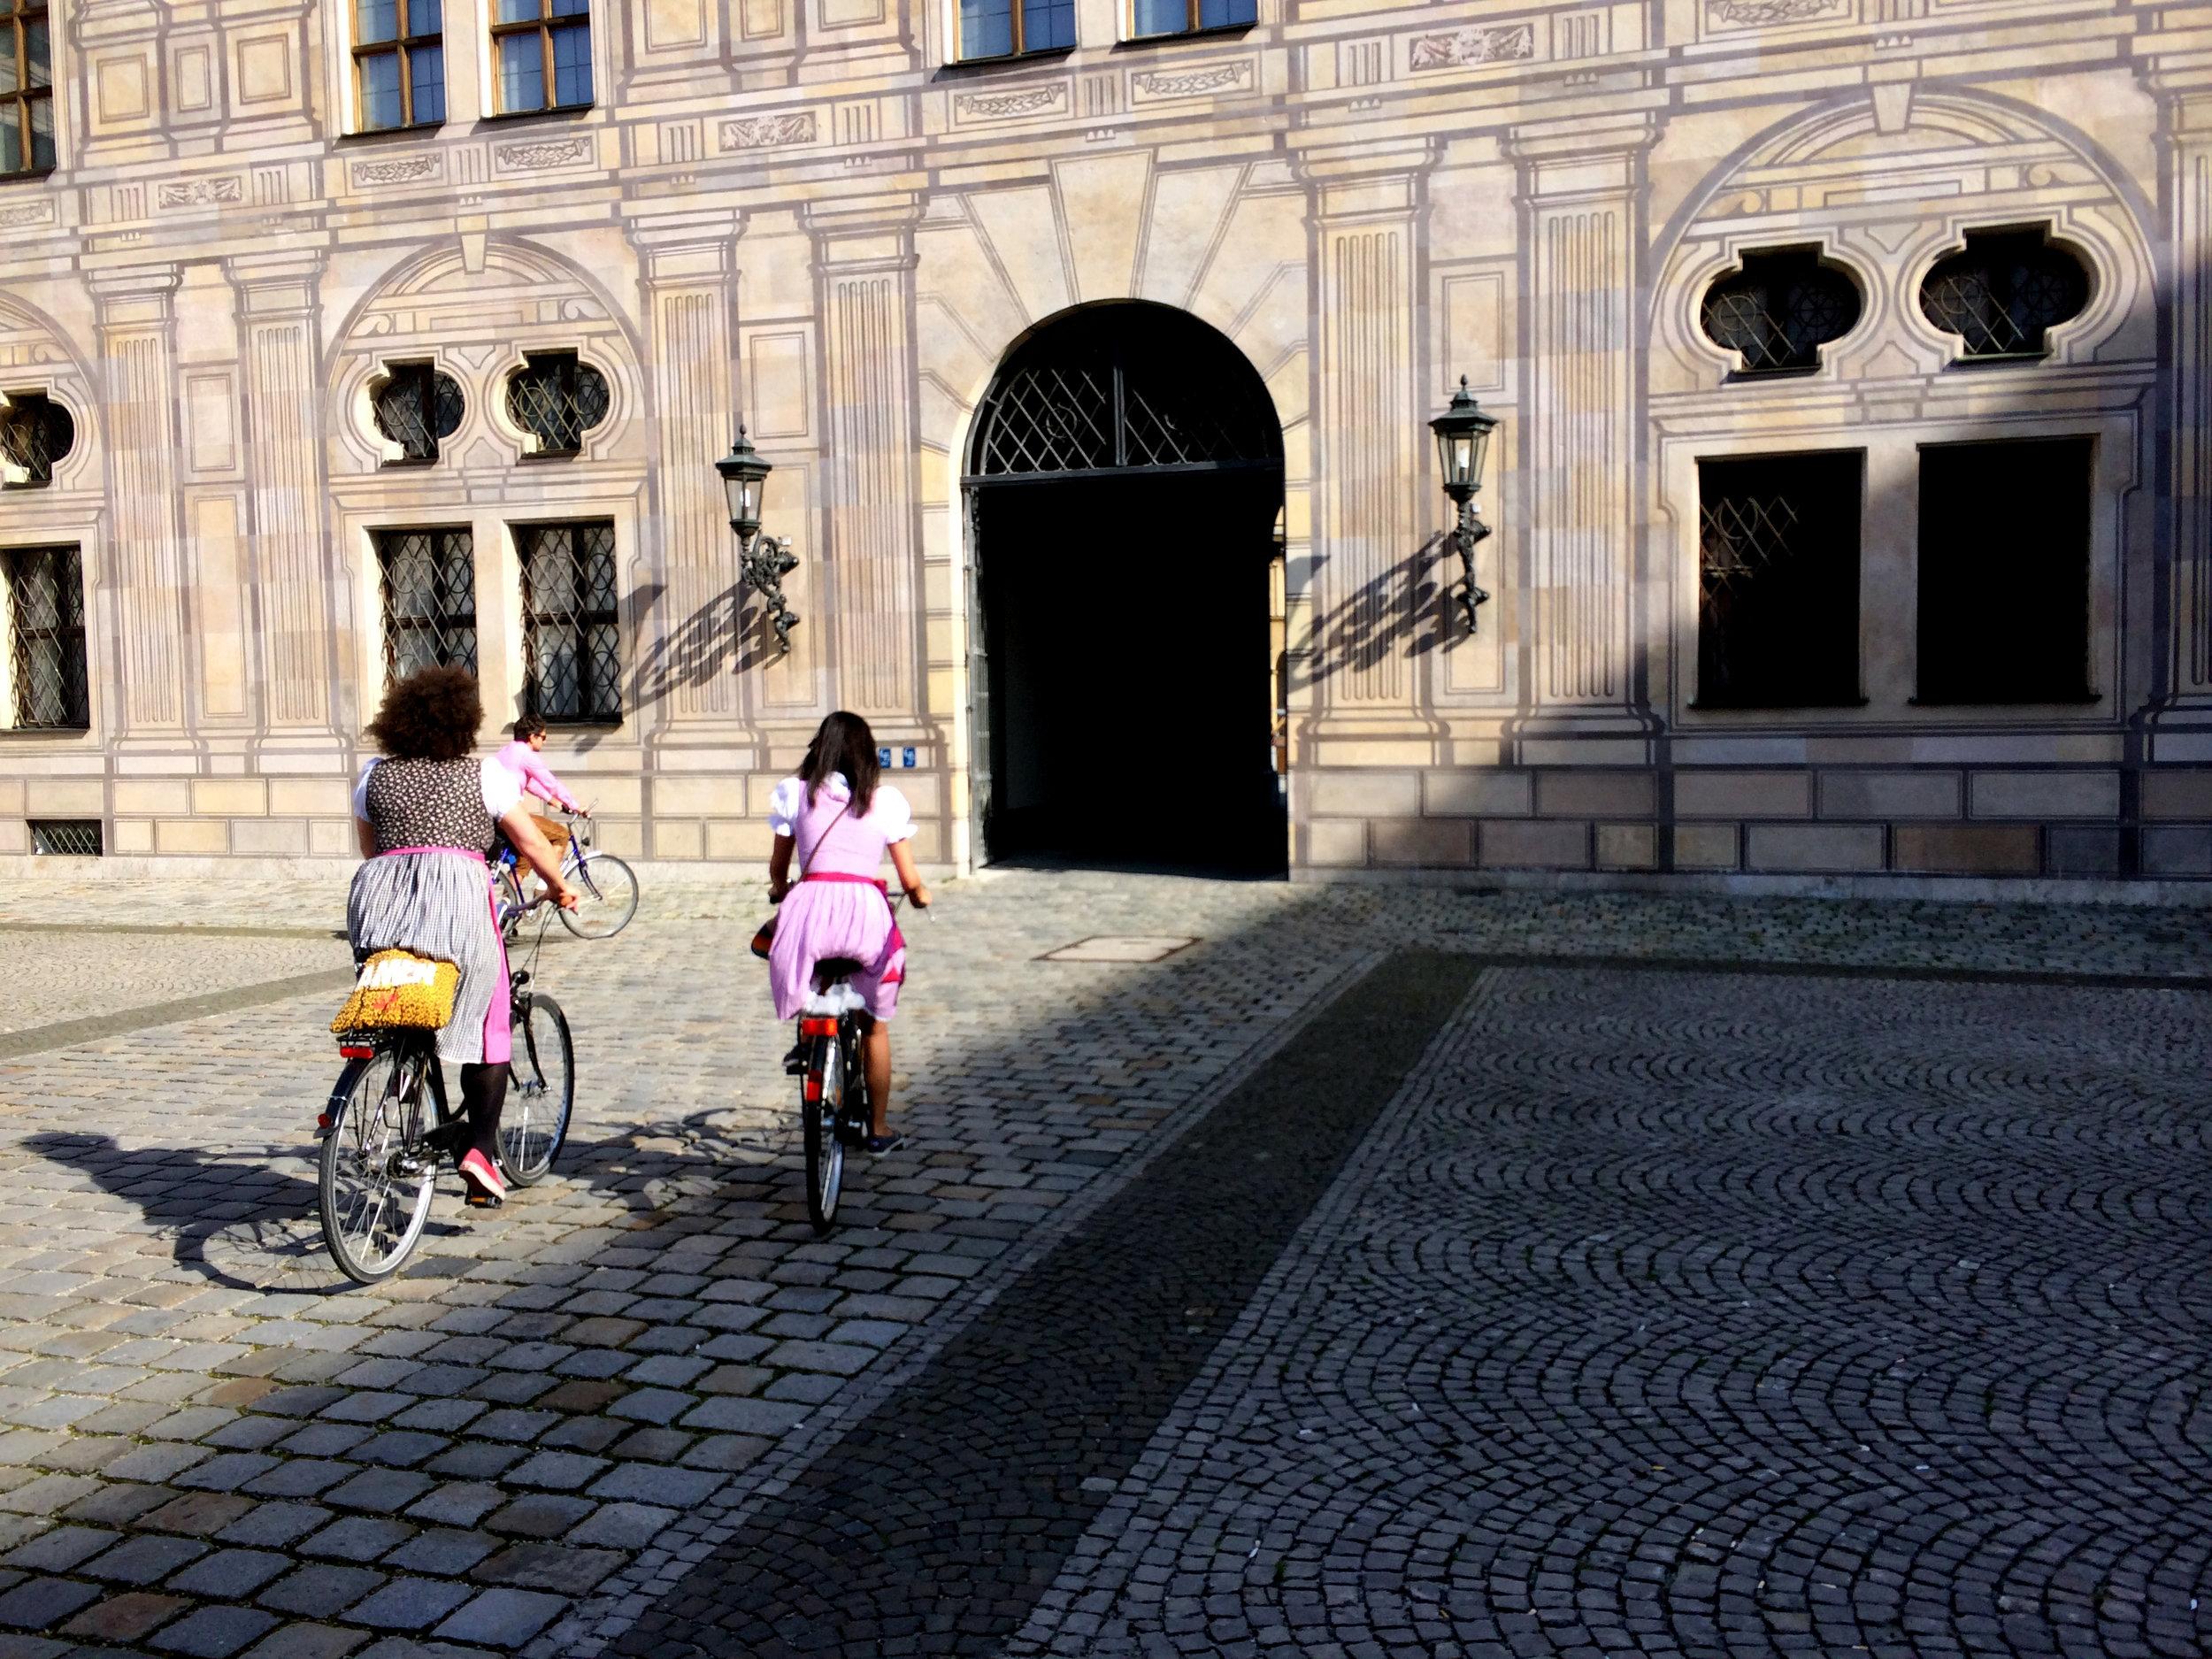 DAY 4:SUNDAY FUNDAY DEUTSCHLAND STYLE - MUNICH, GERMANYApprox 3 hours biking